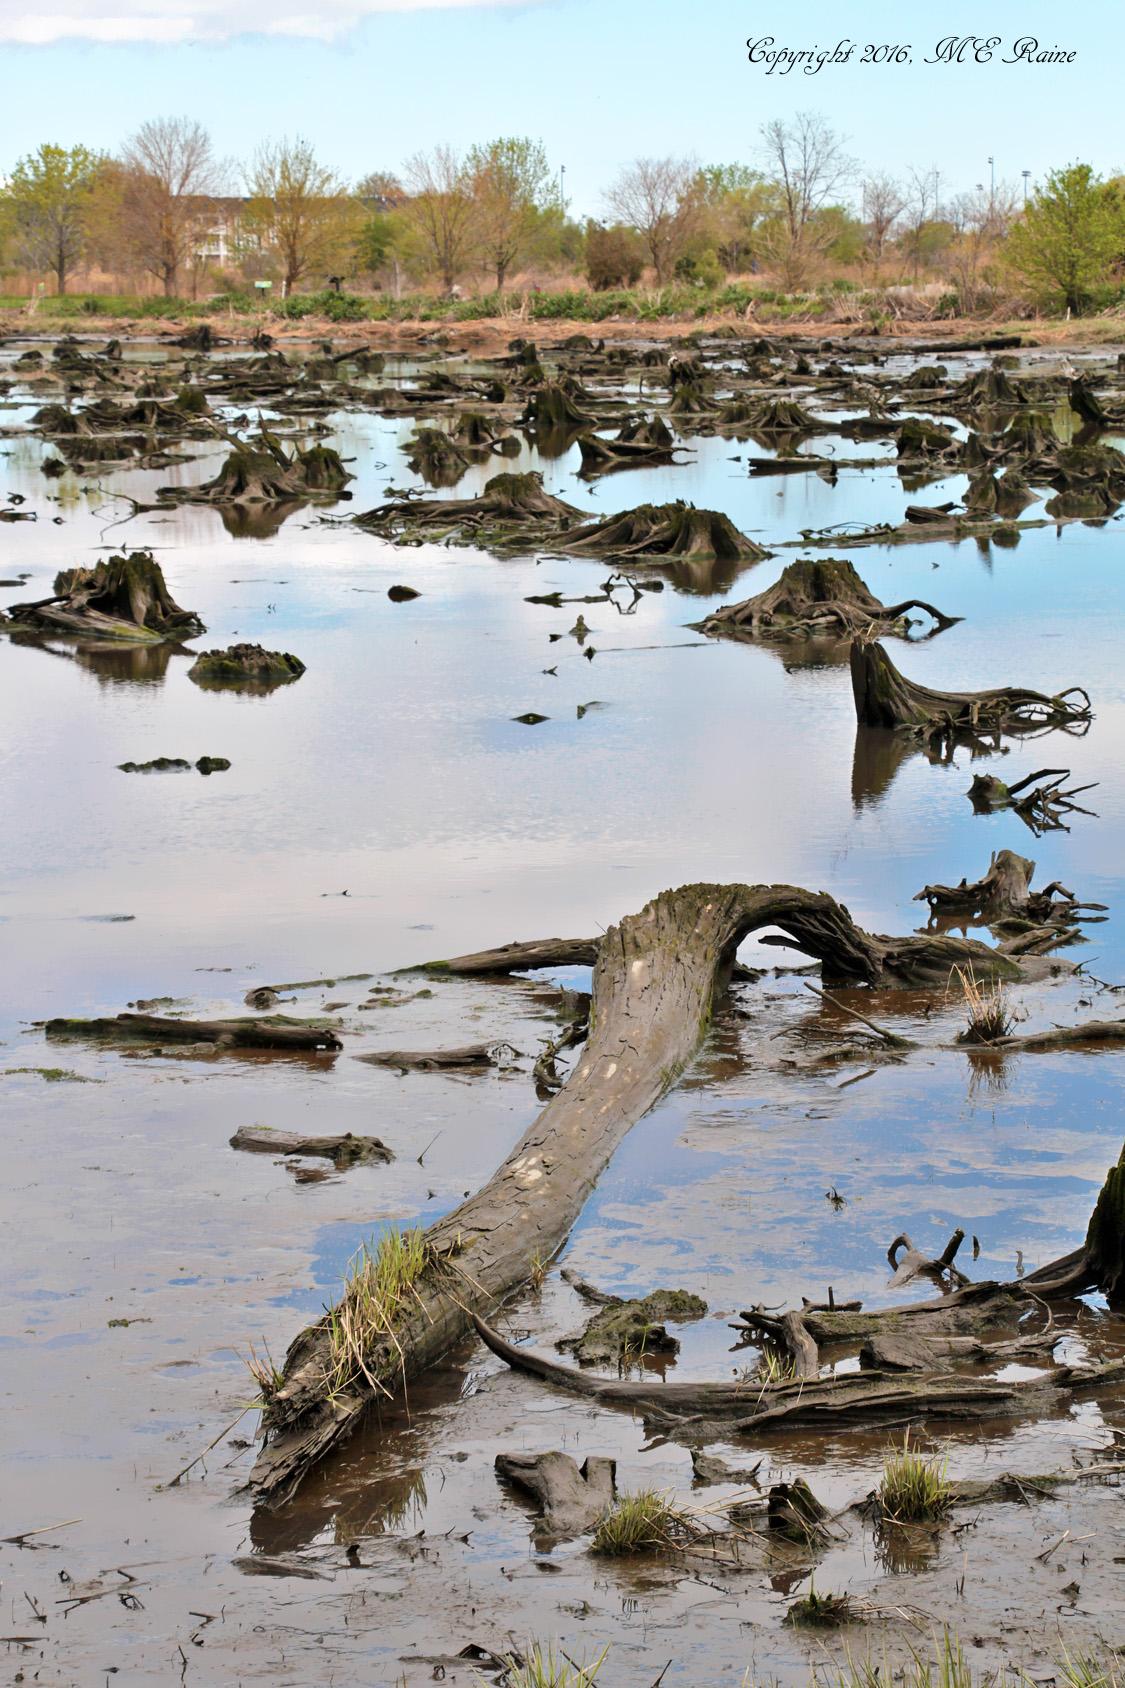 479 V Mudflats 019cf MCM Mdwlnds NJ Low Tide Cedar Stumps The Crocodile 042716 OK FLICKR (3)